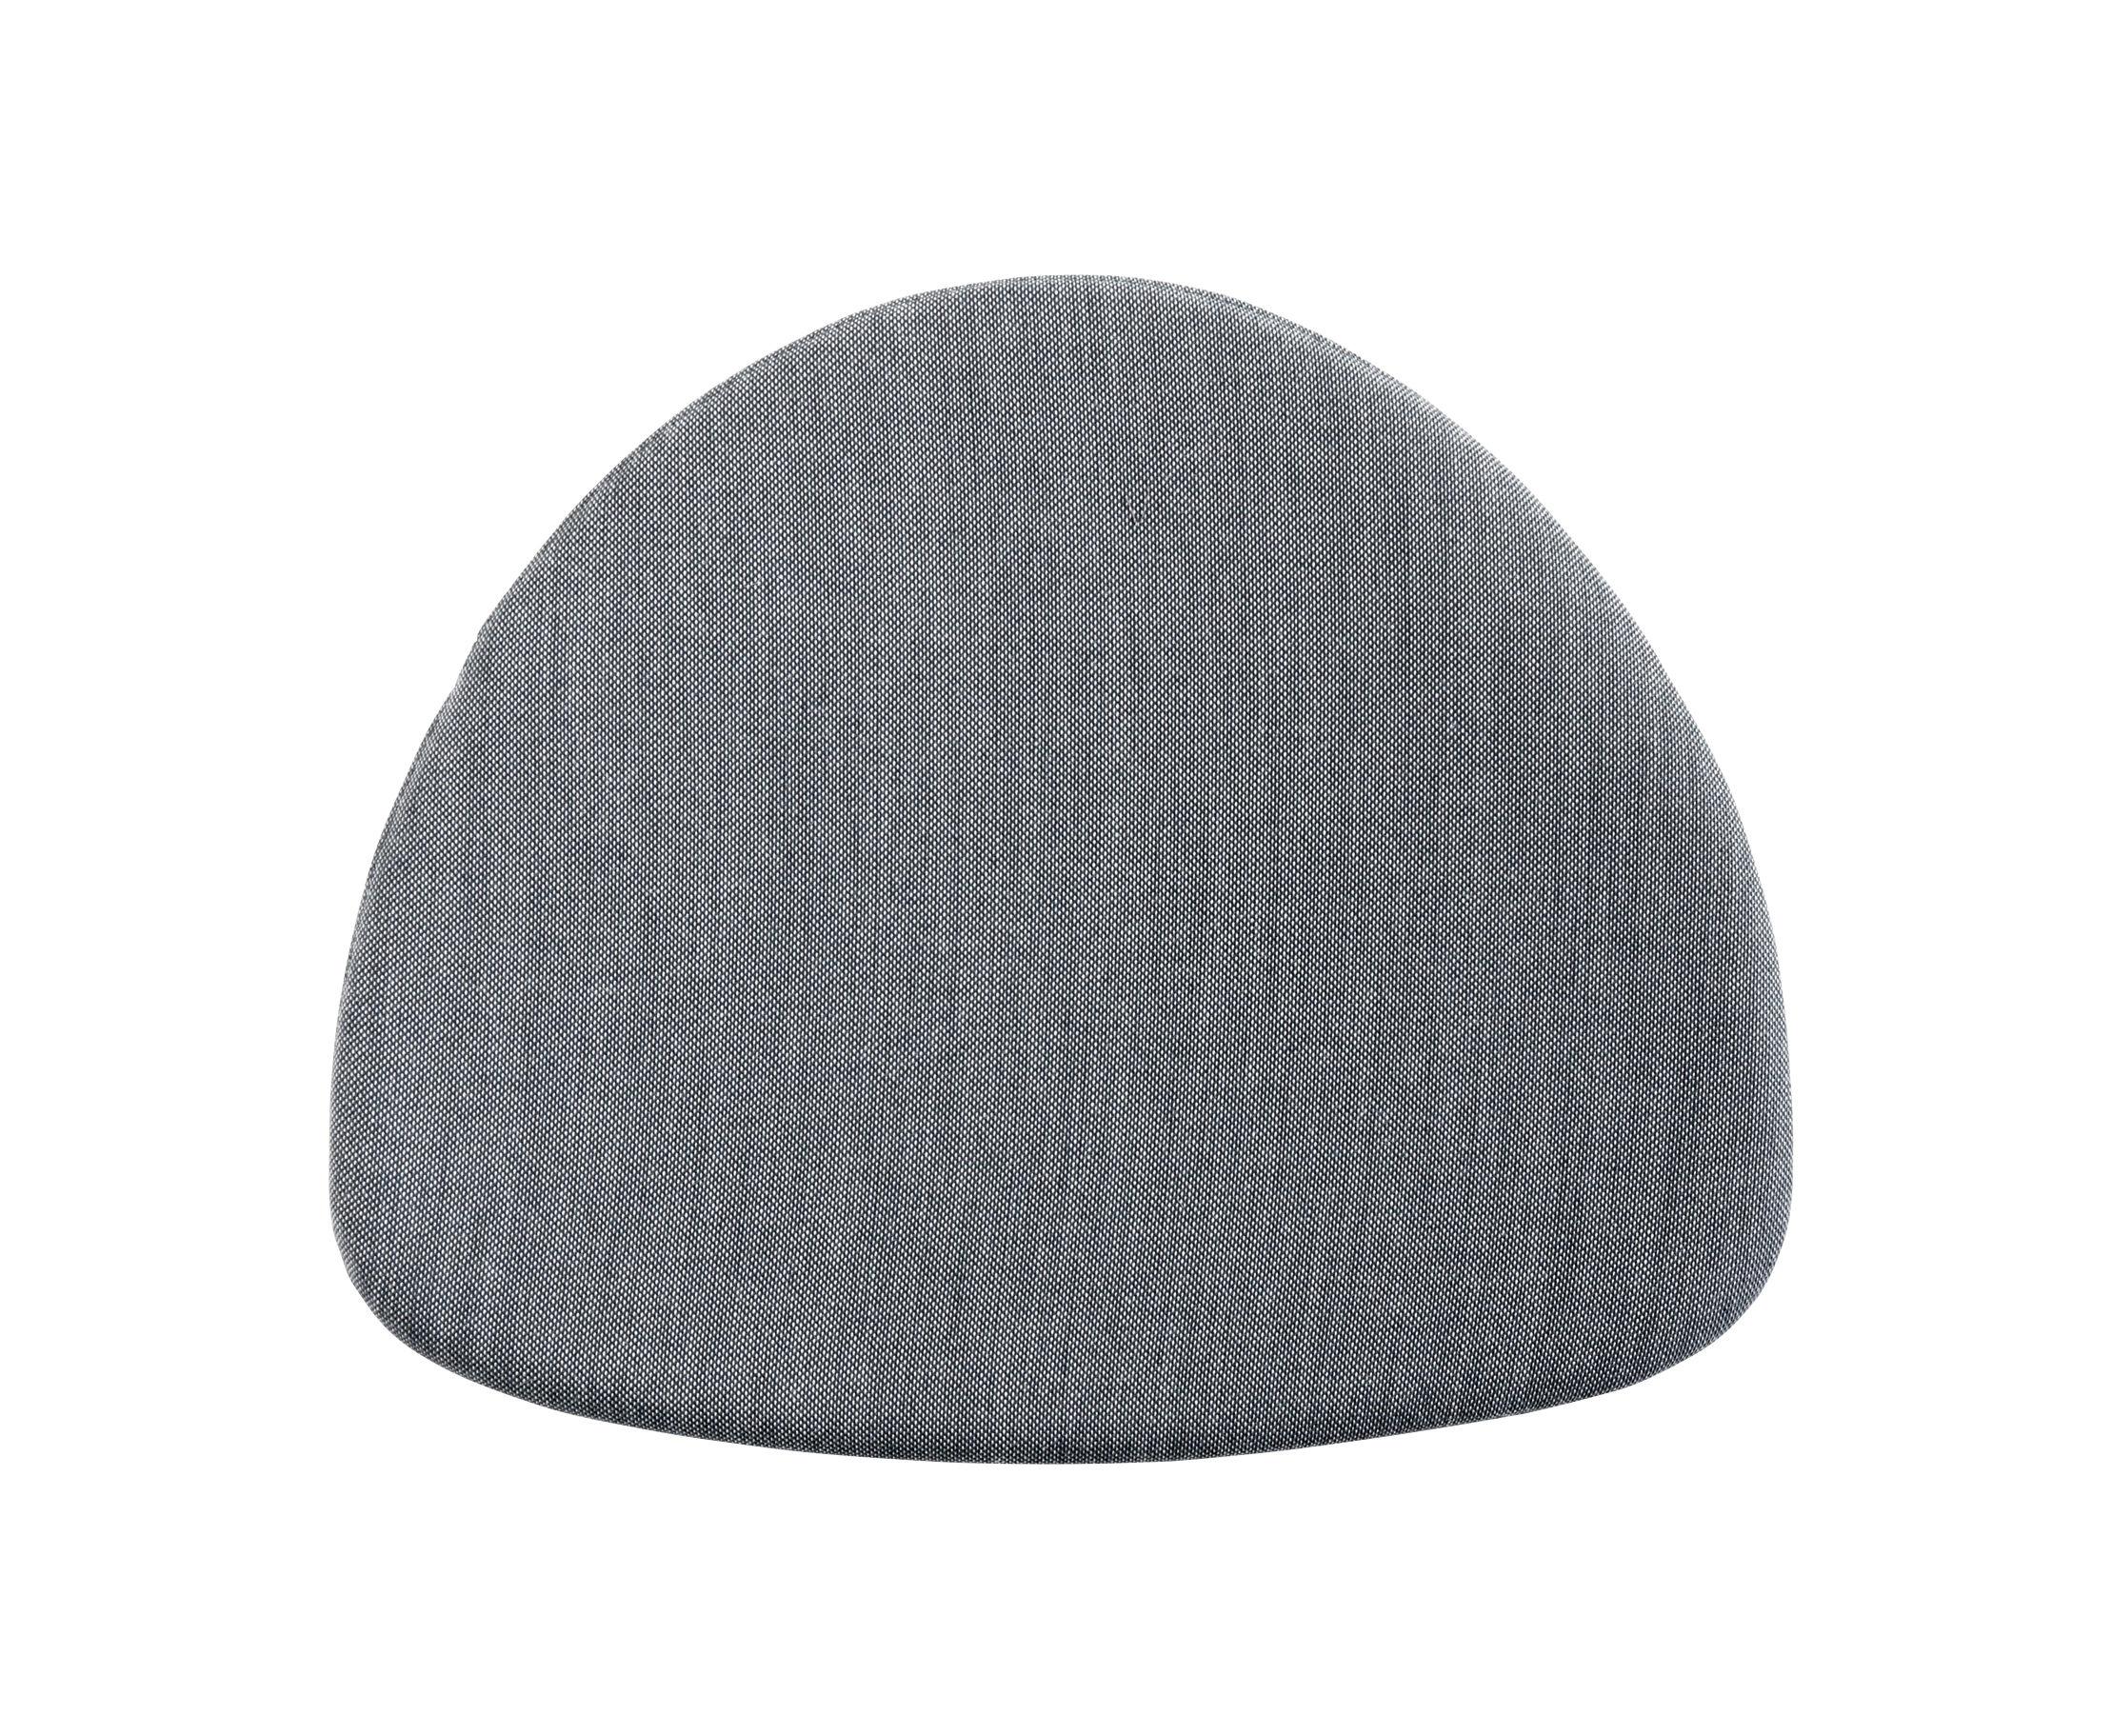 Cuscino per seduta per la sedia j104 grigio scuro by hay made